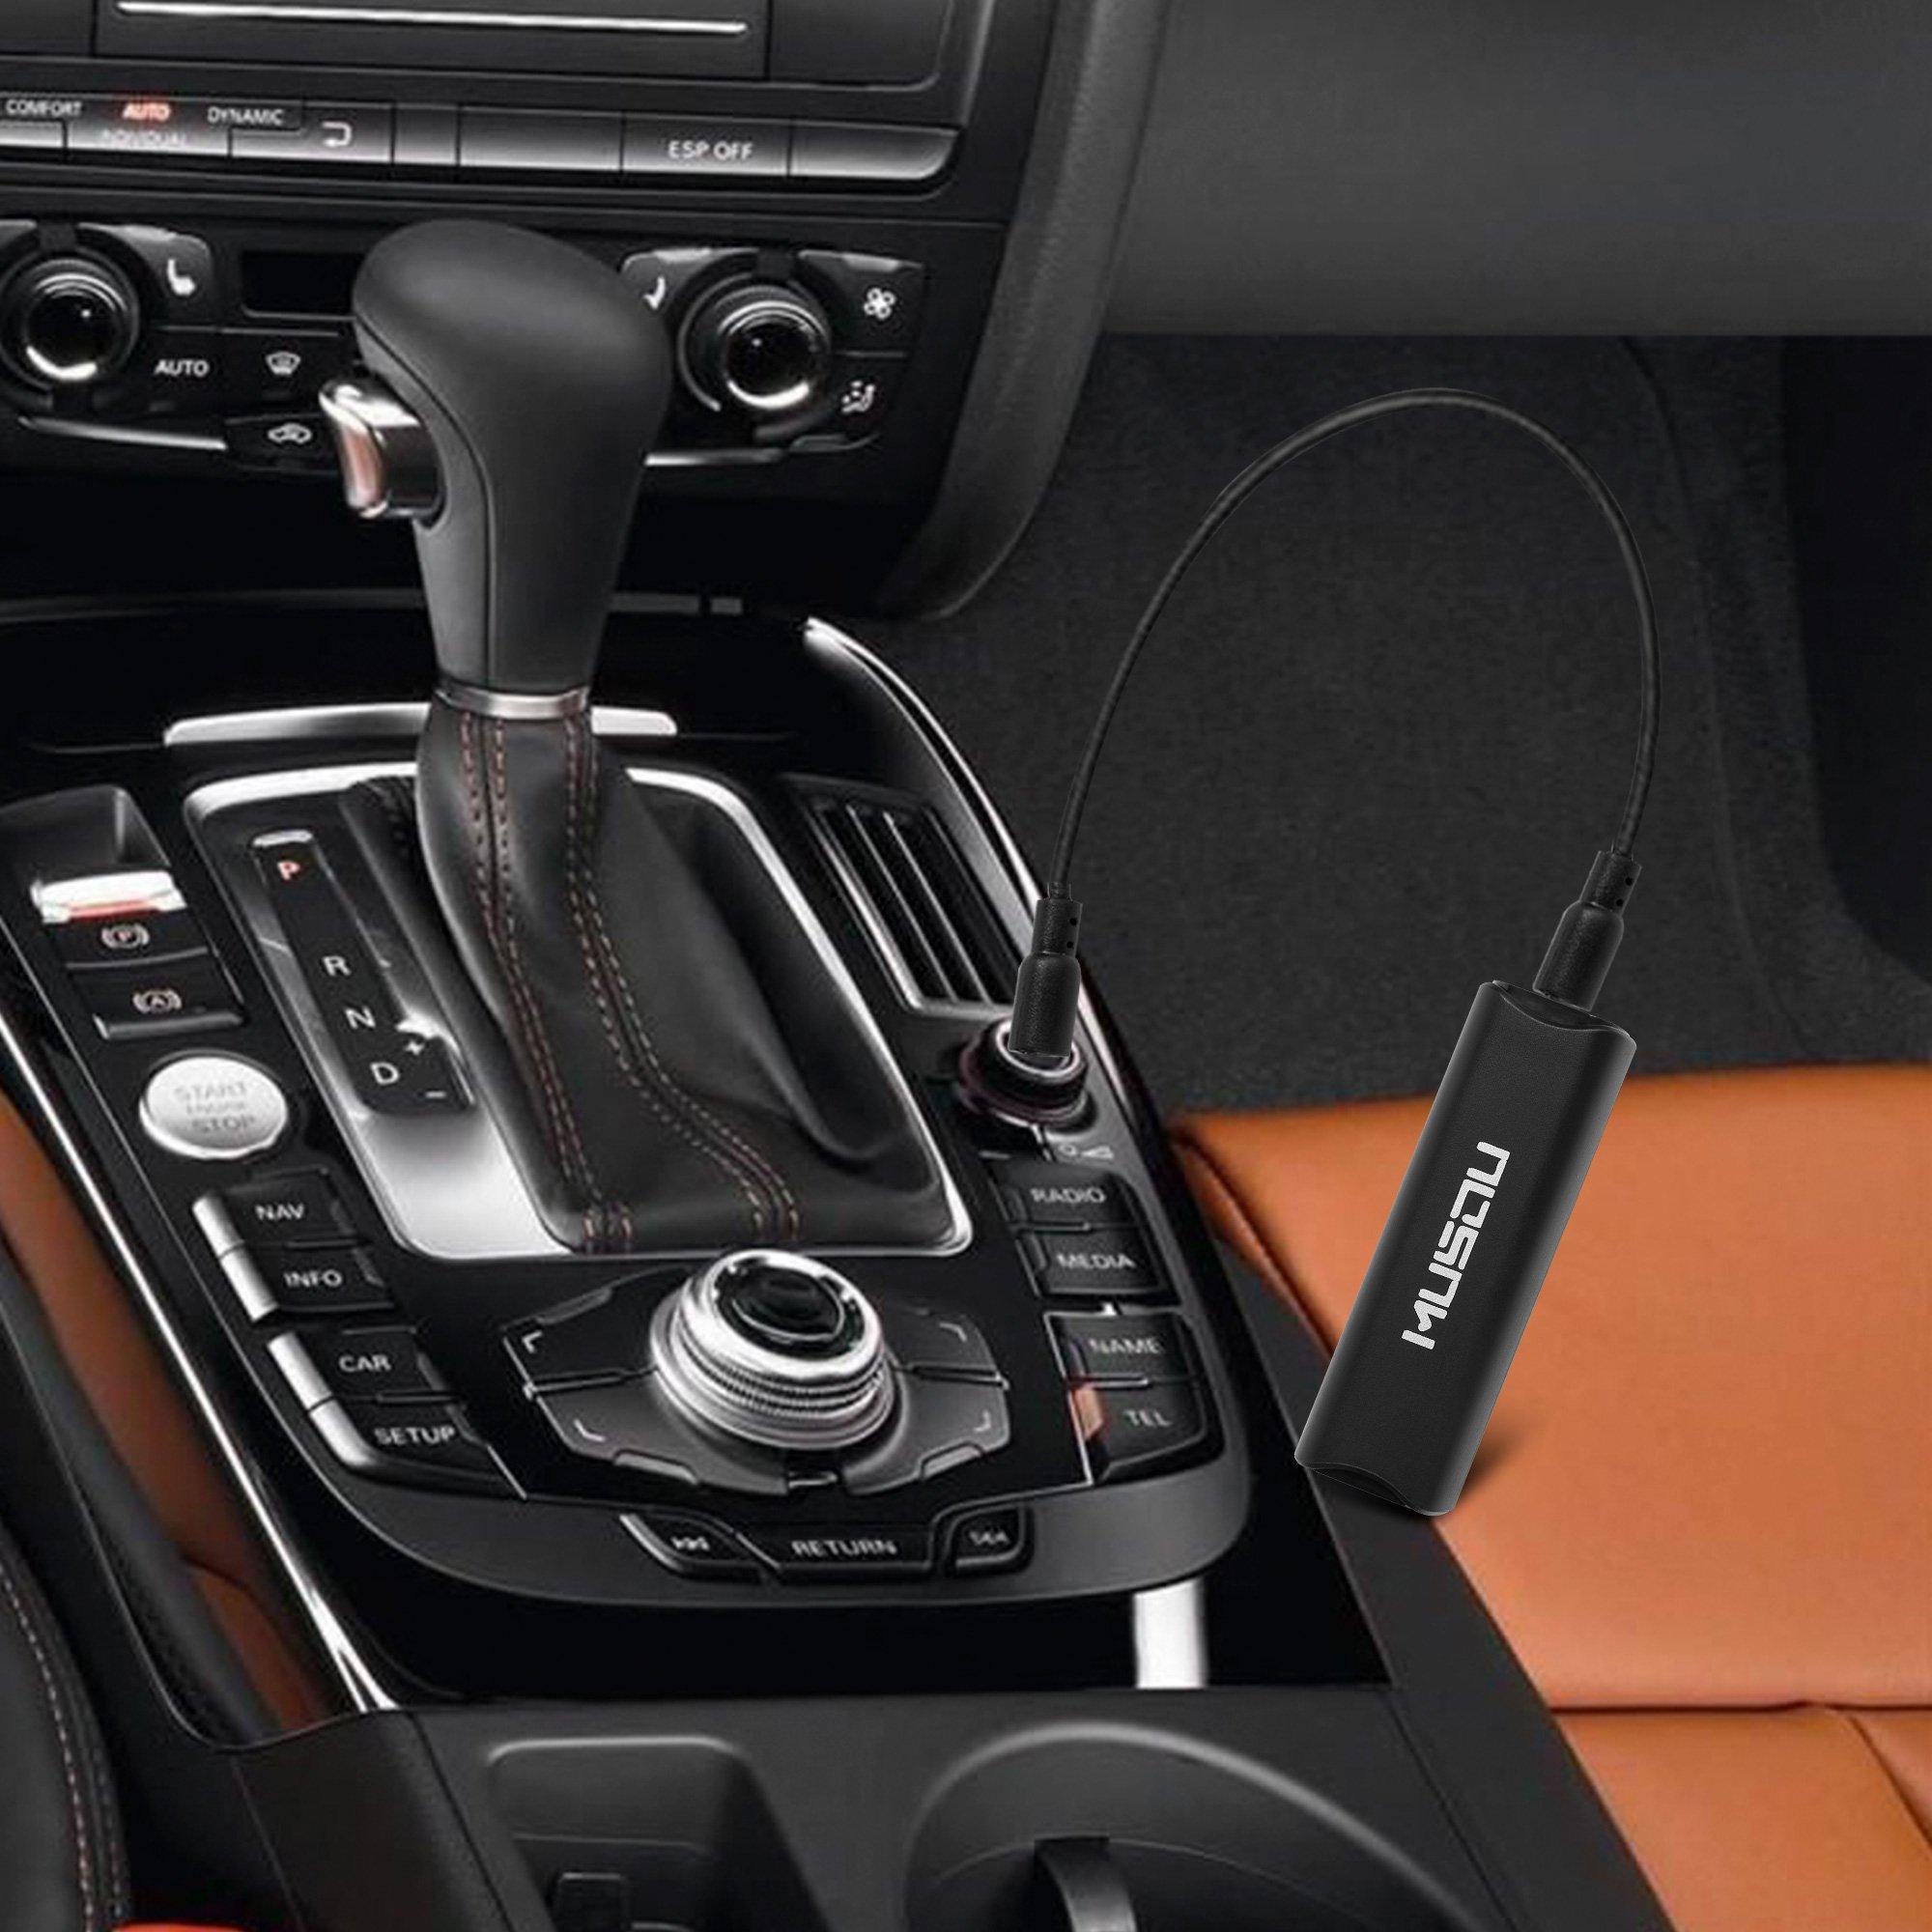 Musou Ground Loop Noise Isolator, Entstörfilter Auto Radio Entstörer Noise Filter für Bluetooth Car Audio, Heim, PC-Stereo-System mit 3,5-mm-Audiokabel